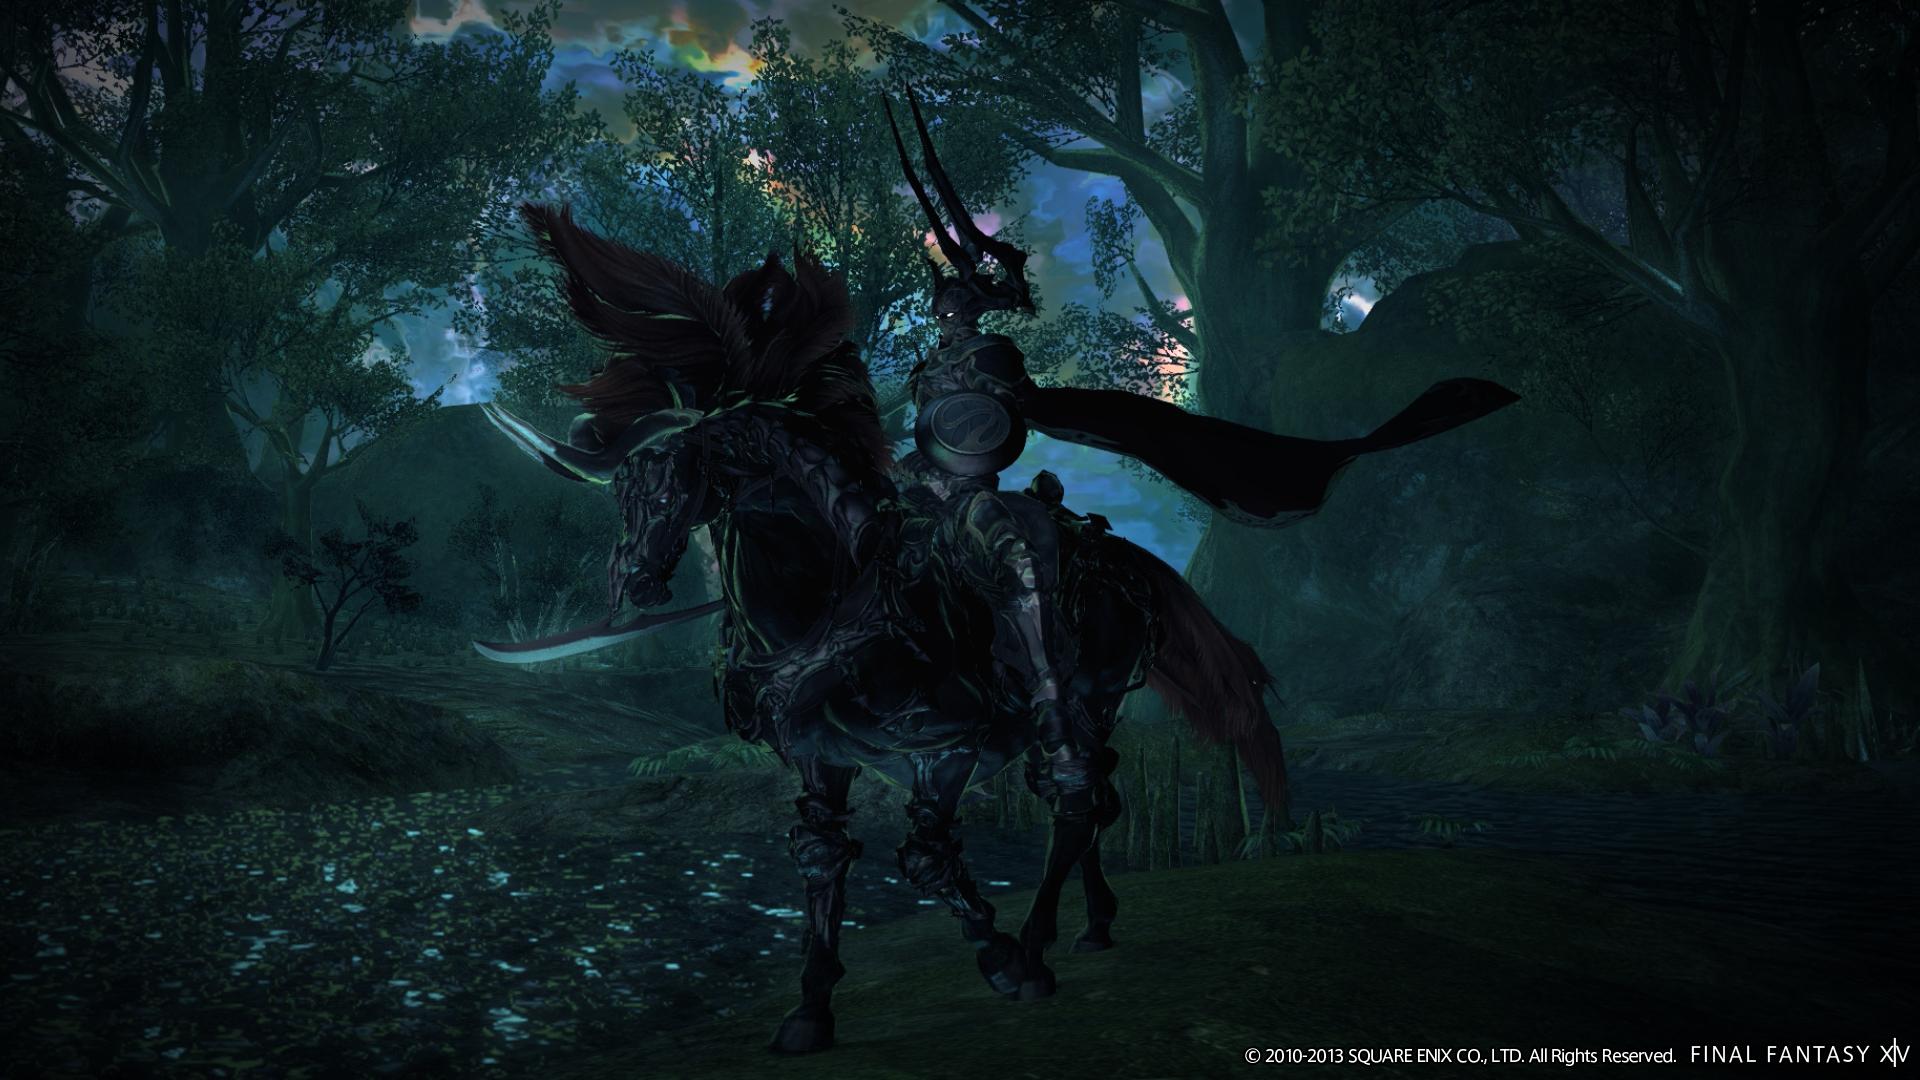 Final Fantasy 14: A Realm Reborn for Windows PC screenshots